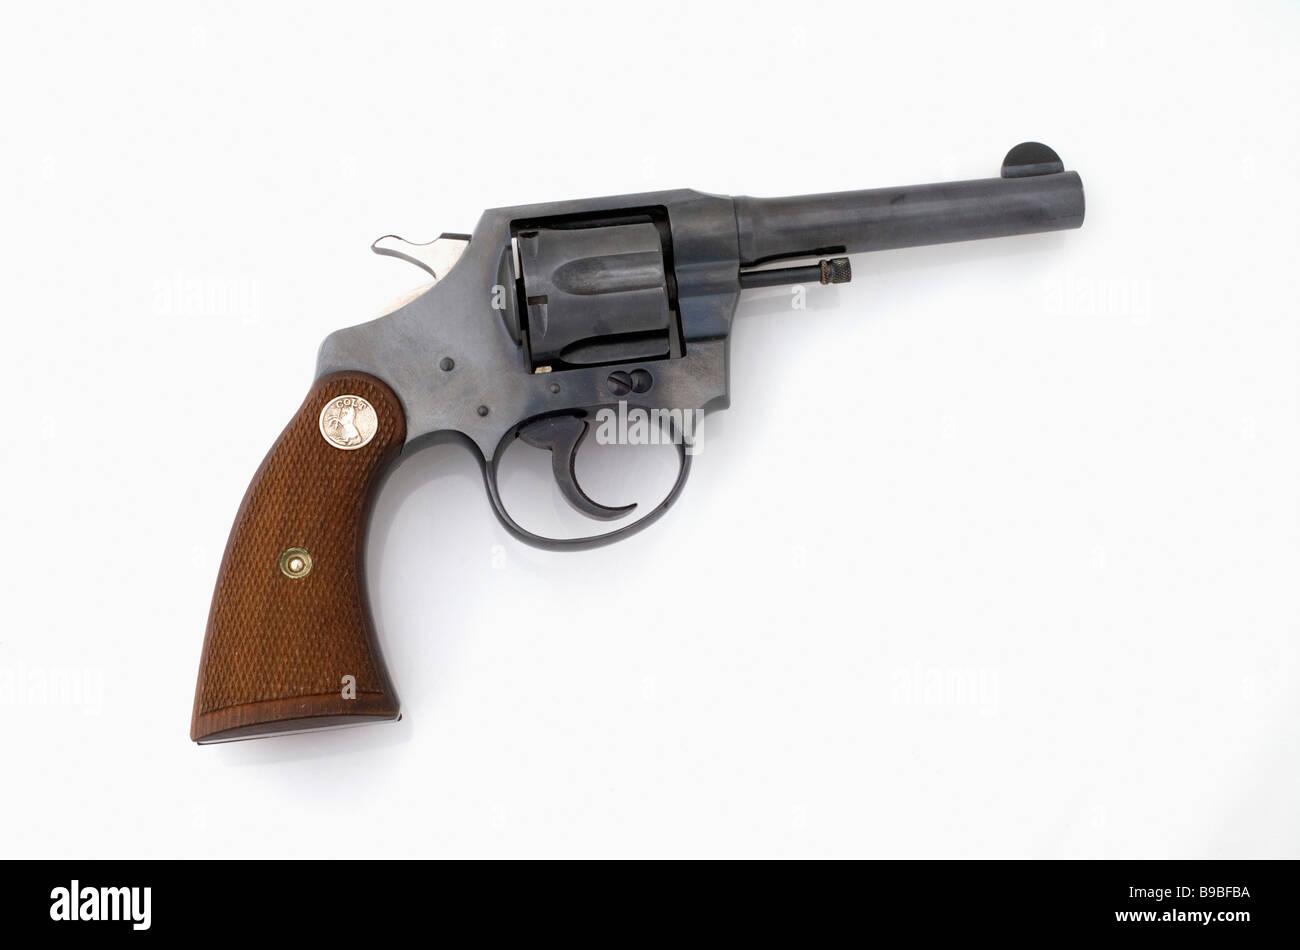 colt revolver handgun stock photo 22995822 alamy